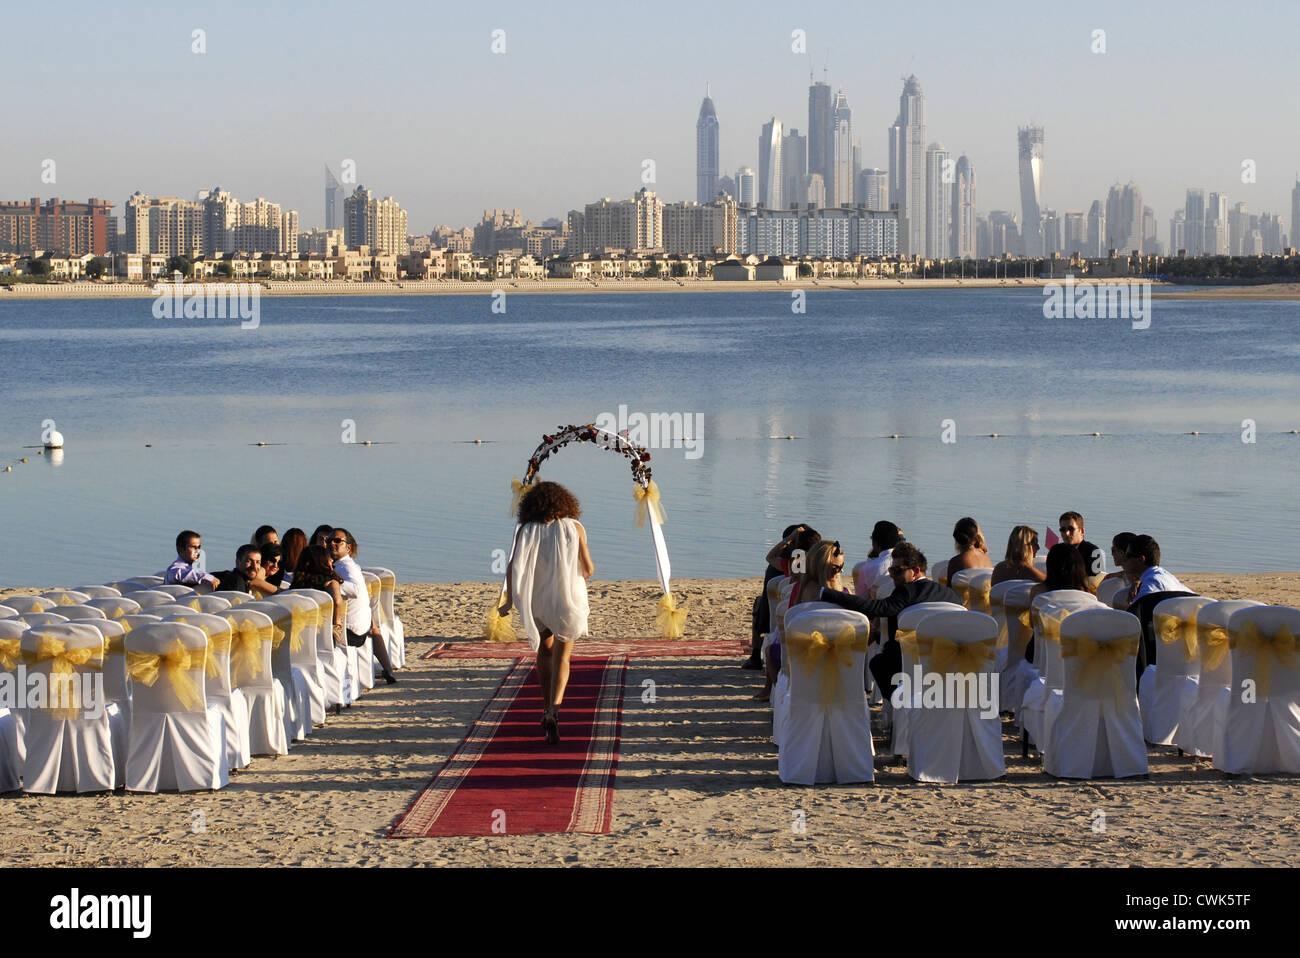 Wedding, Groom, Bride, in the Atlantis Hotel, The Palm, Dubai, UAE, United Arab Emirates, Persian Gulf, Arabian - Stock Image